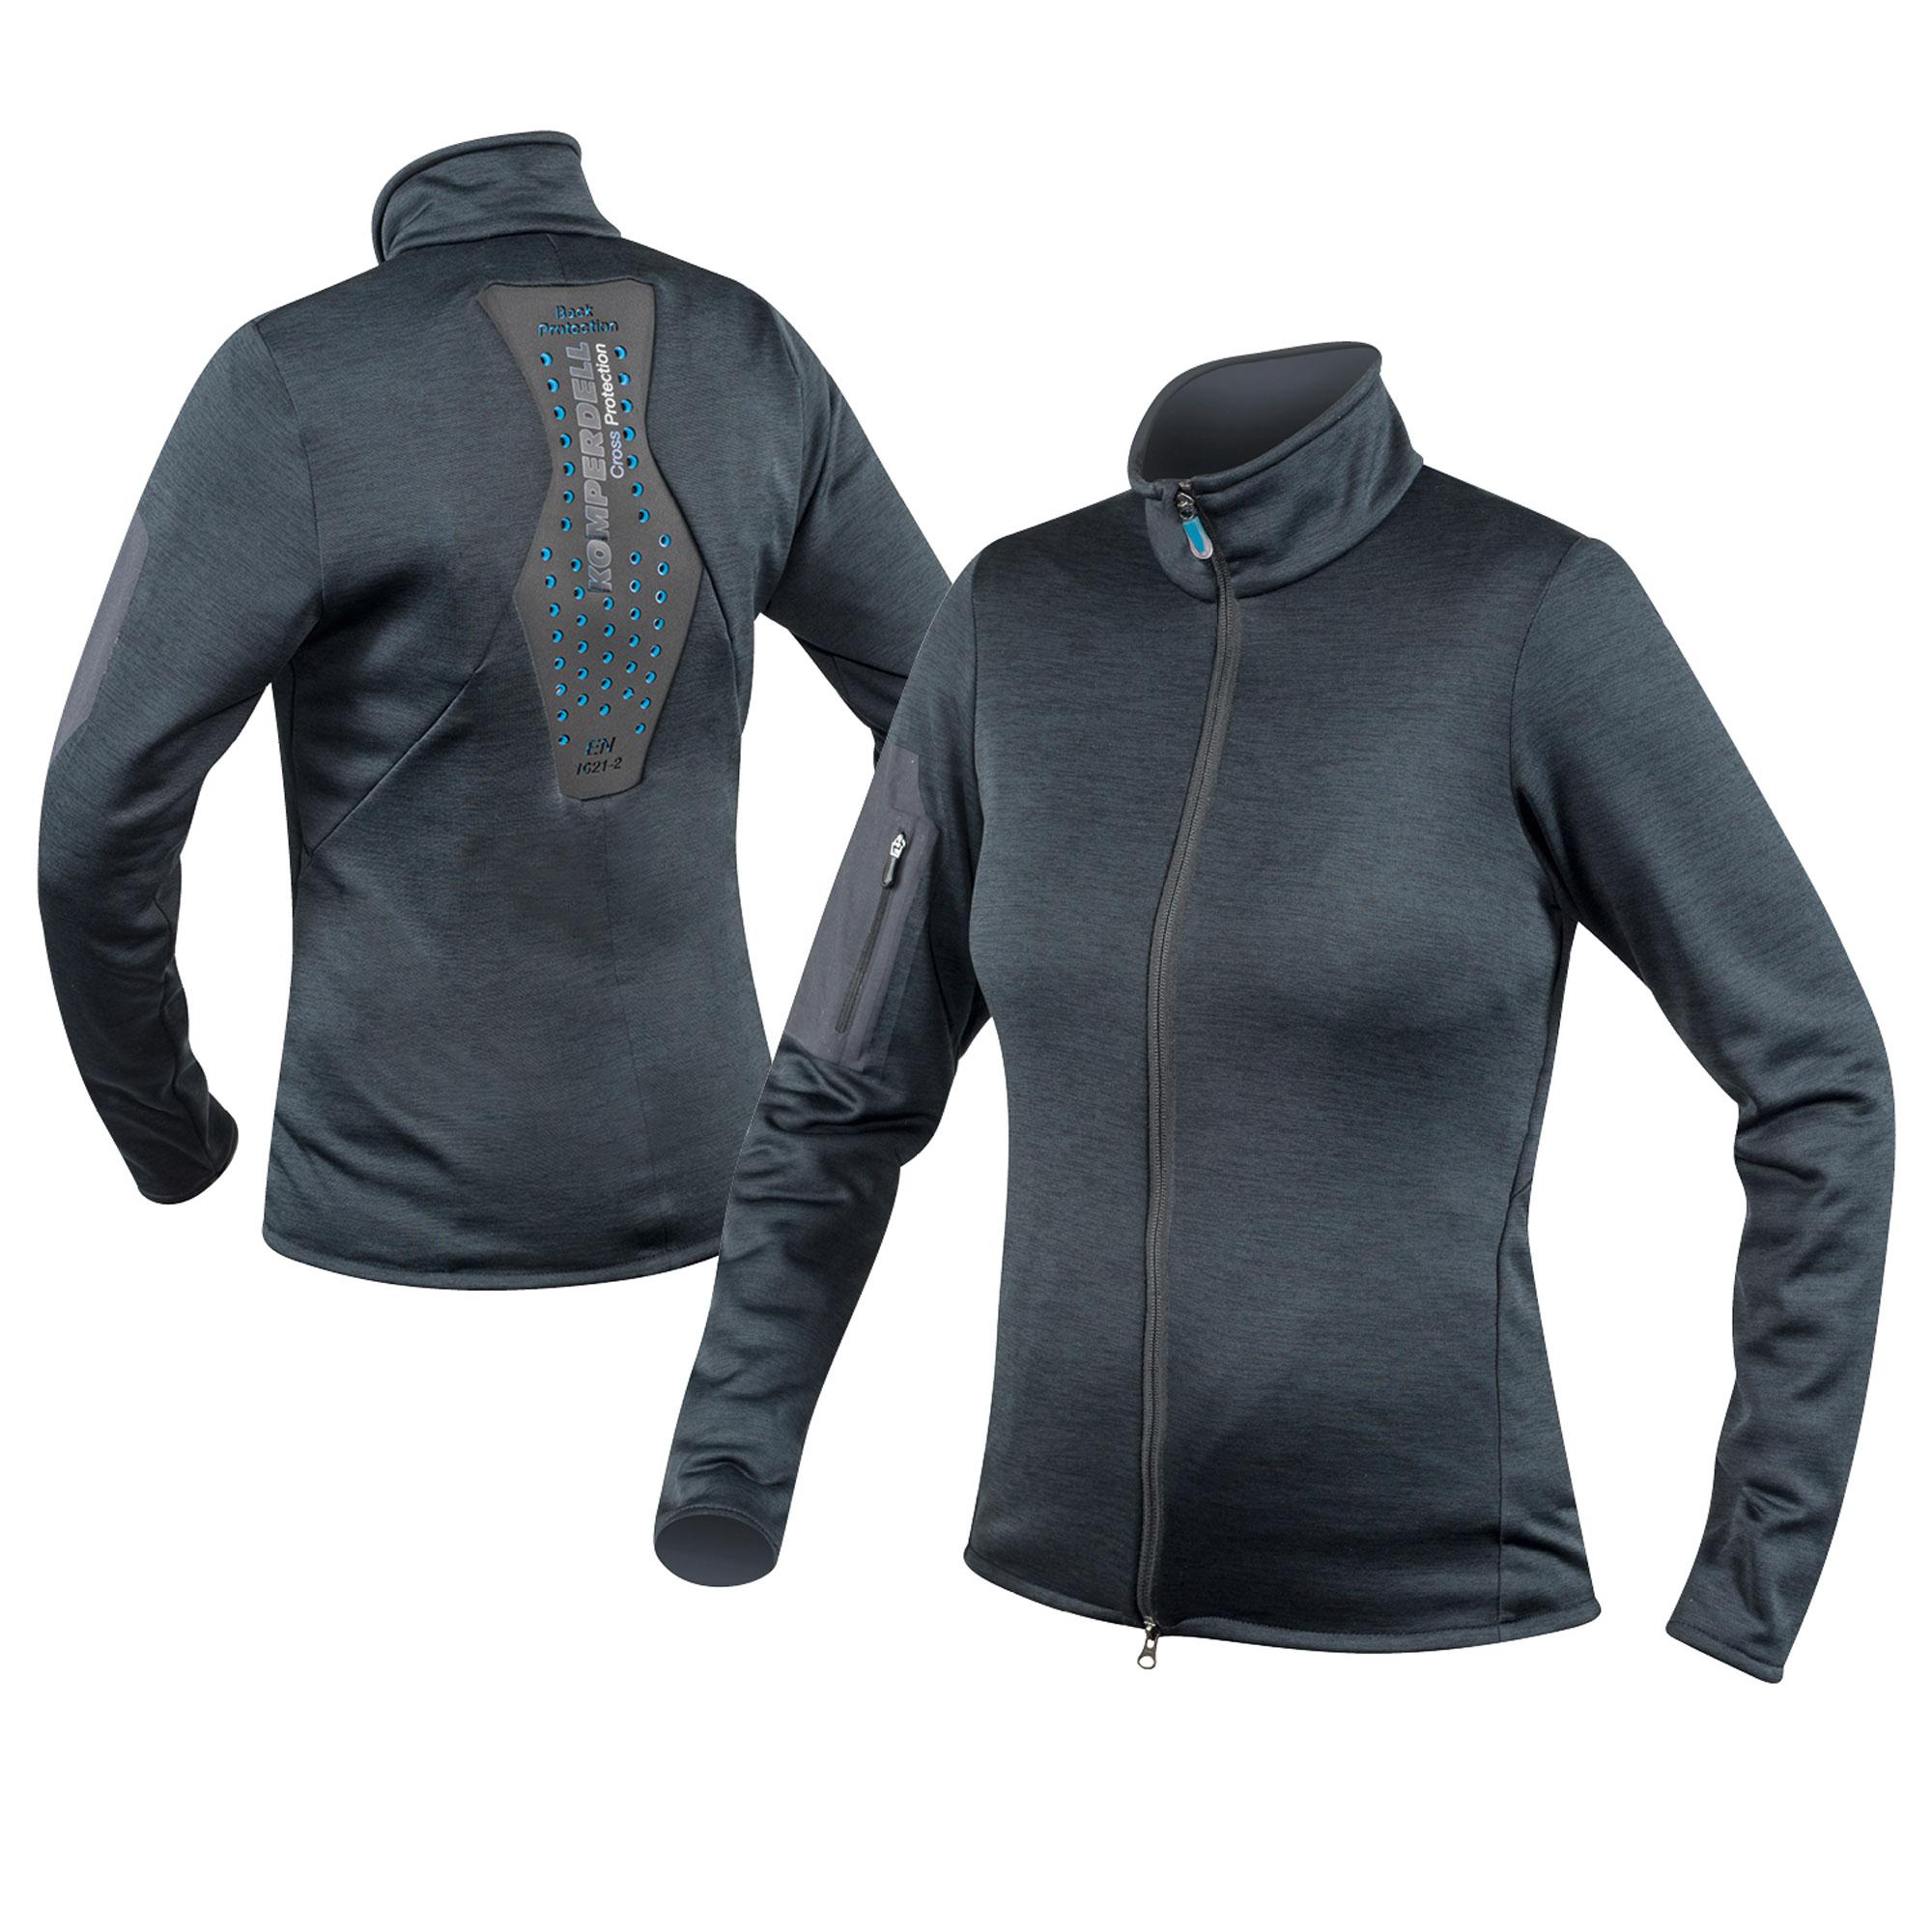 Full Zip Sweater Women